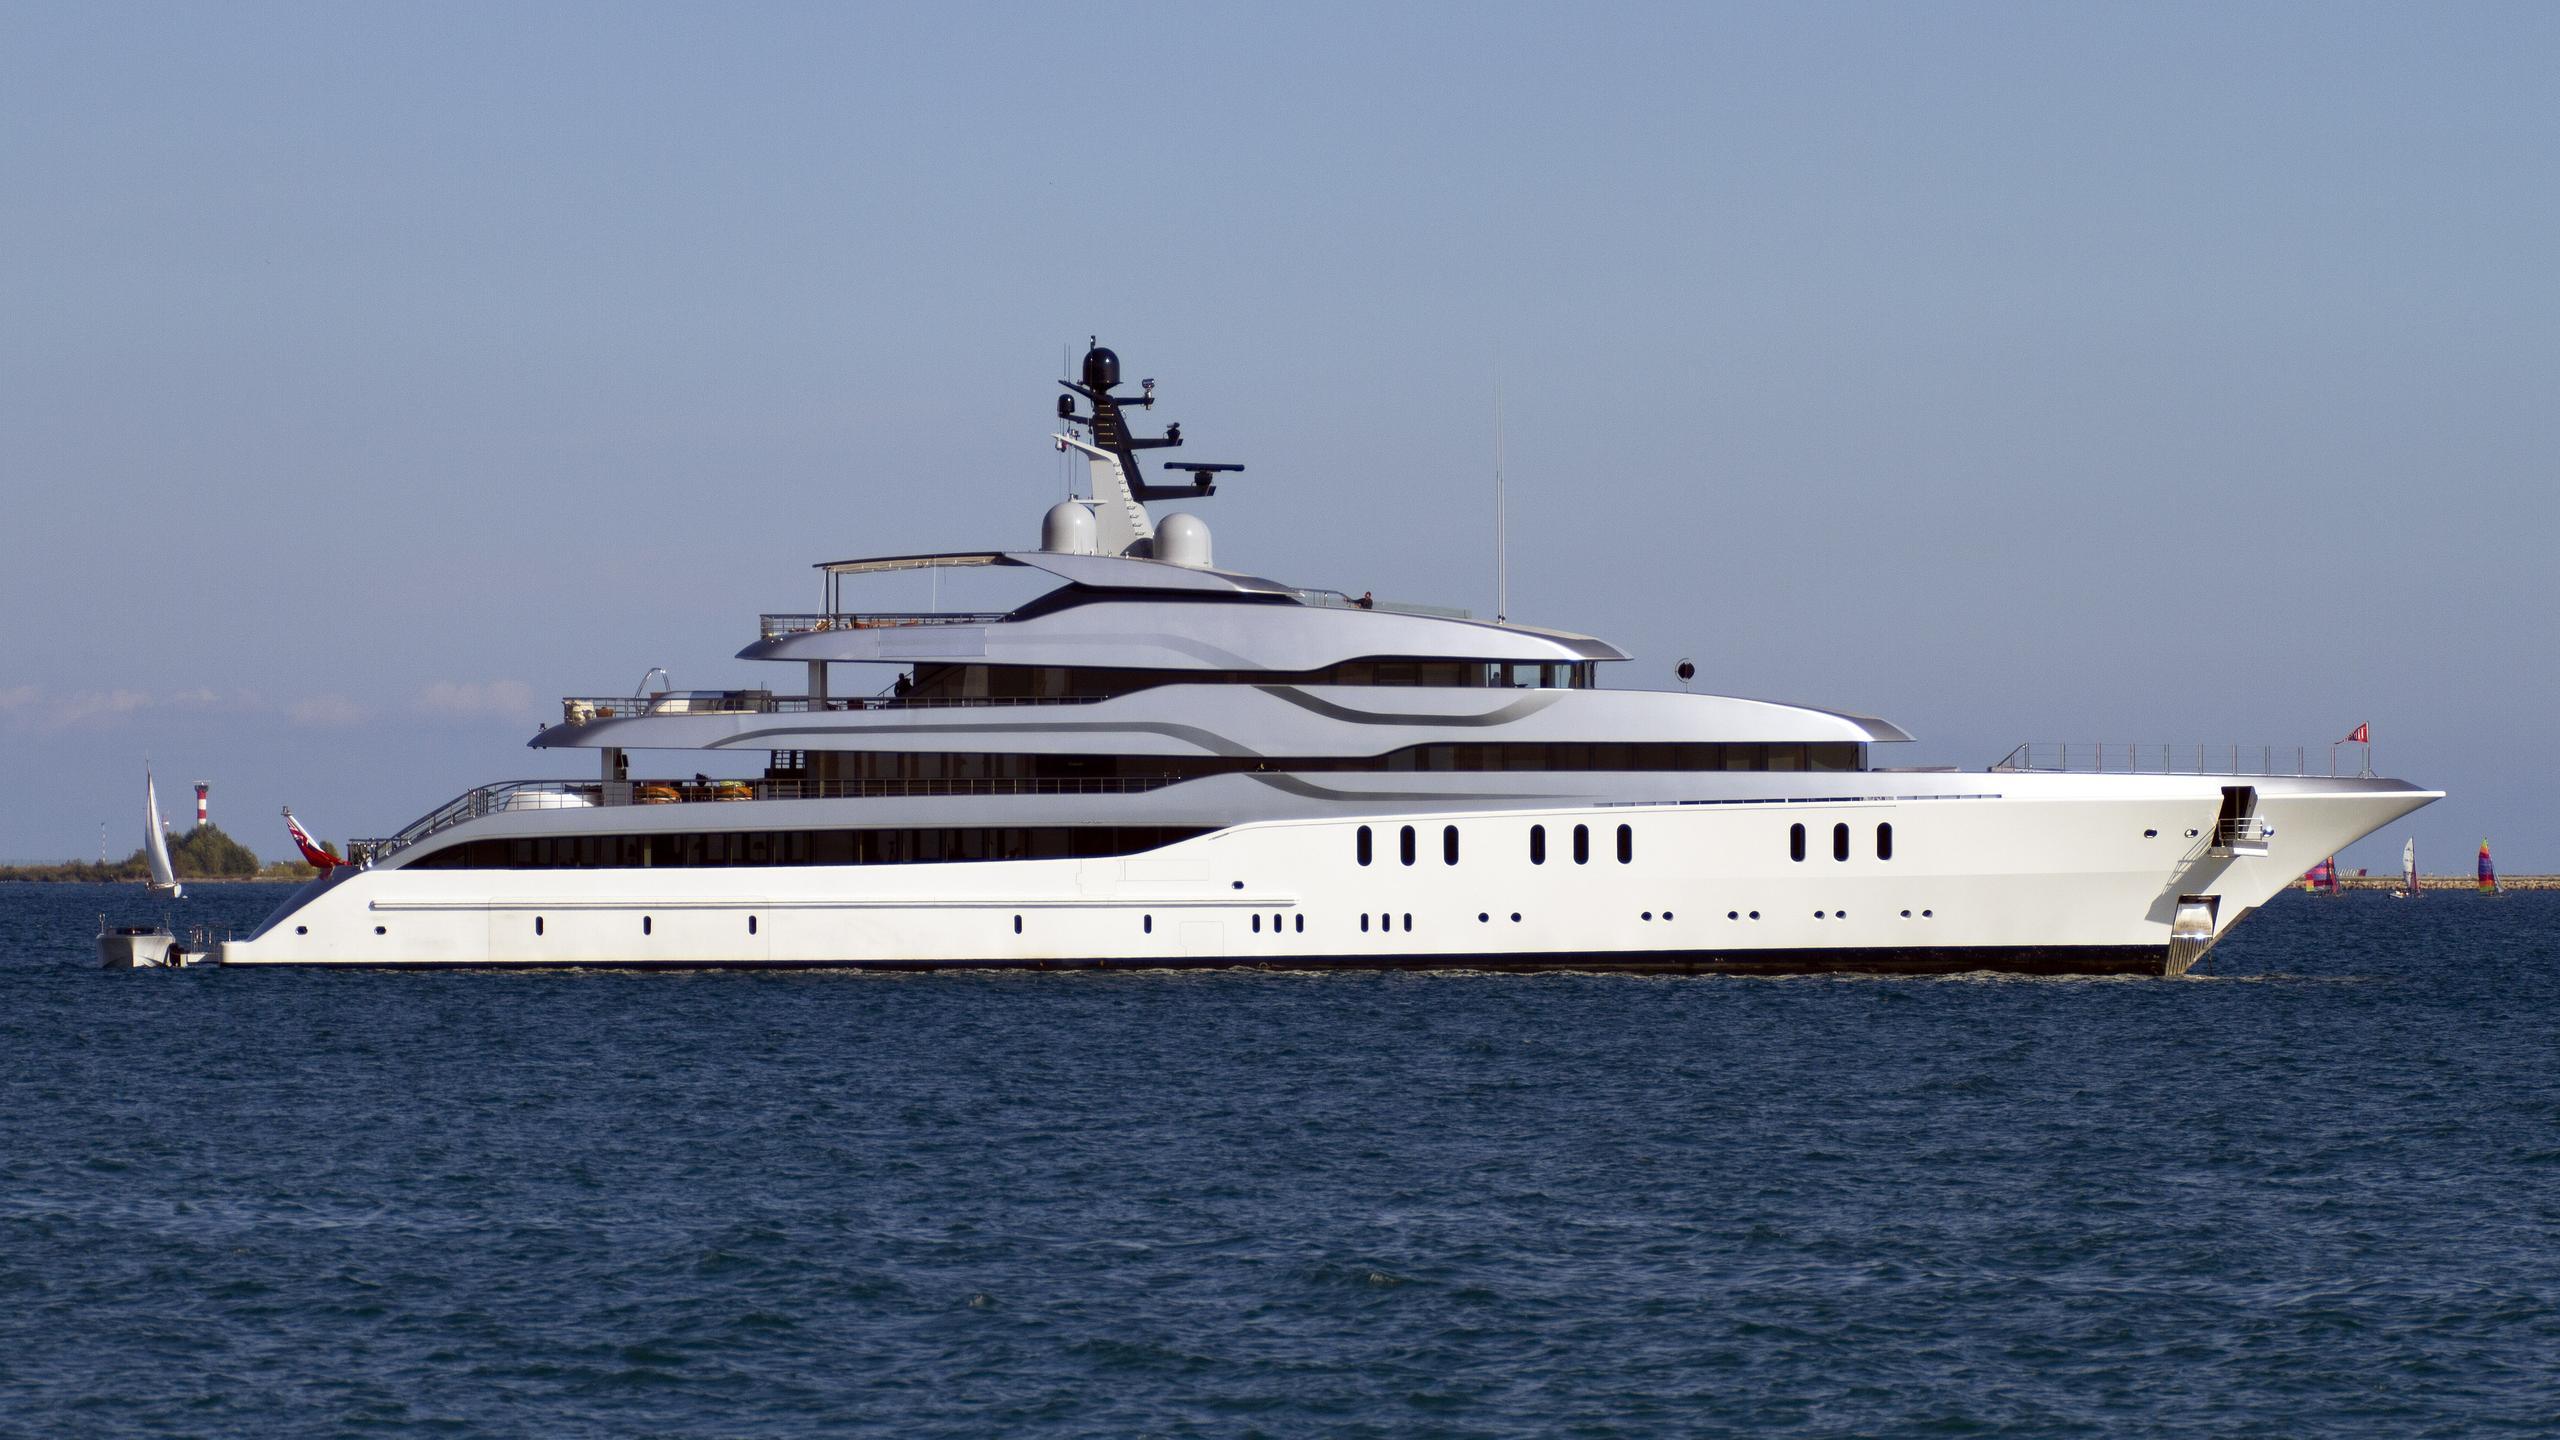 feadship-802-tango-2011-78m-eidsgaard-design-motor-yacht-profile